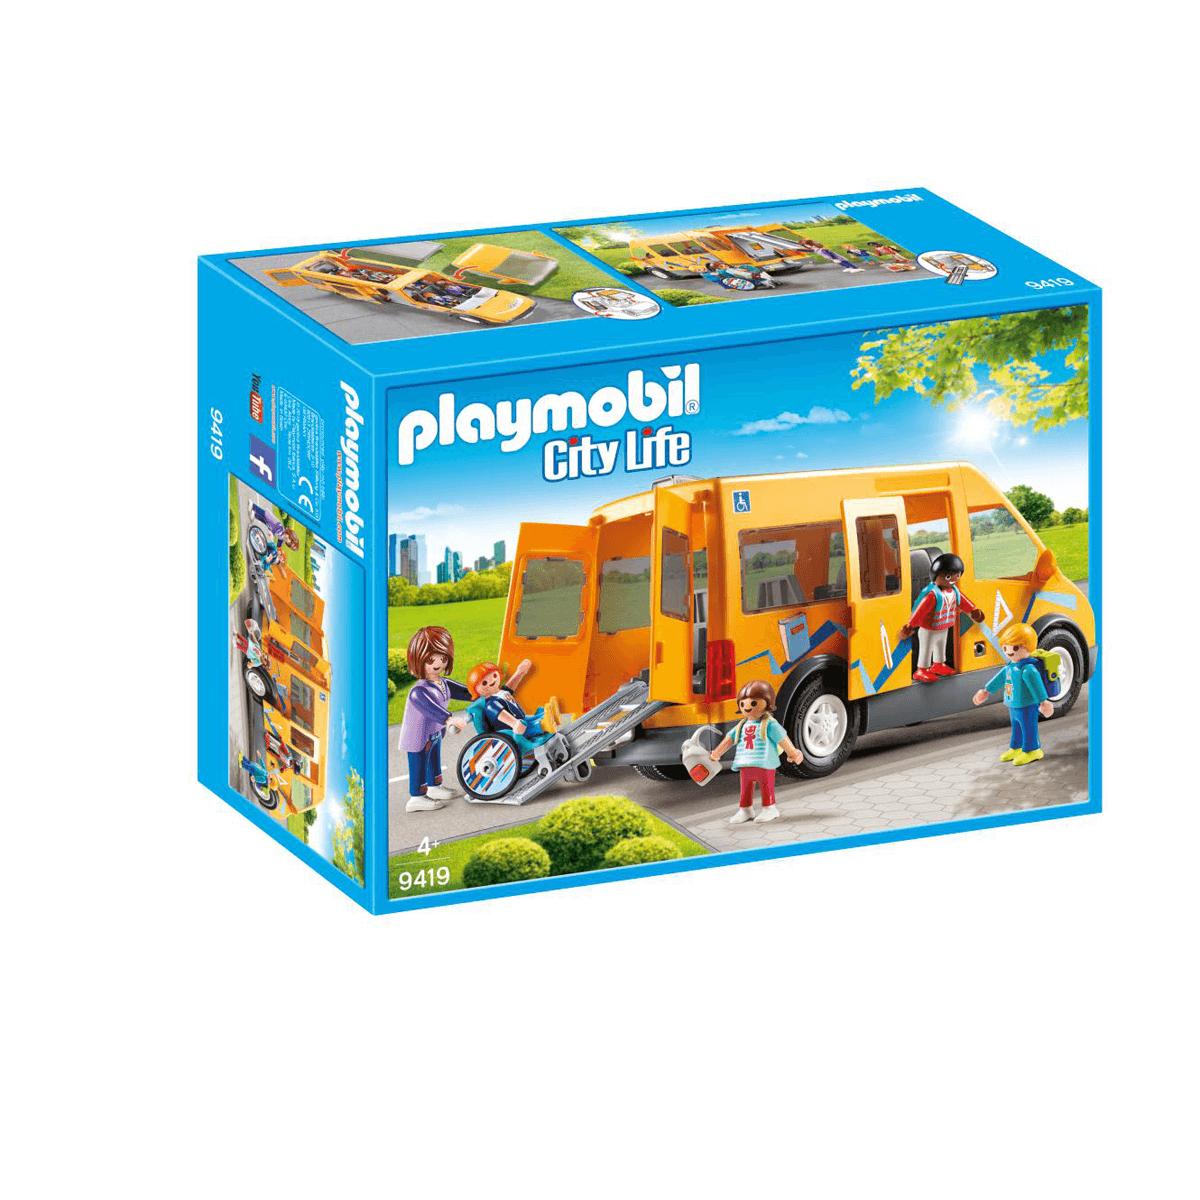 Playmobil City Life School Van with Folding Ramp - 9419